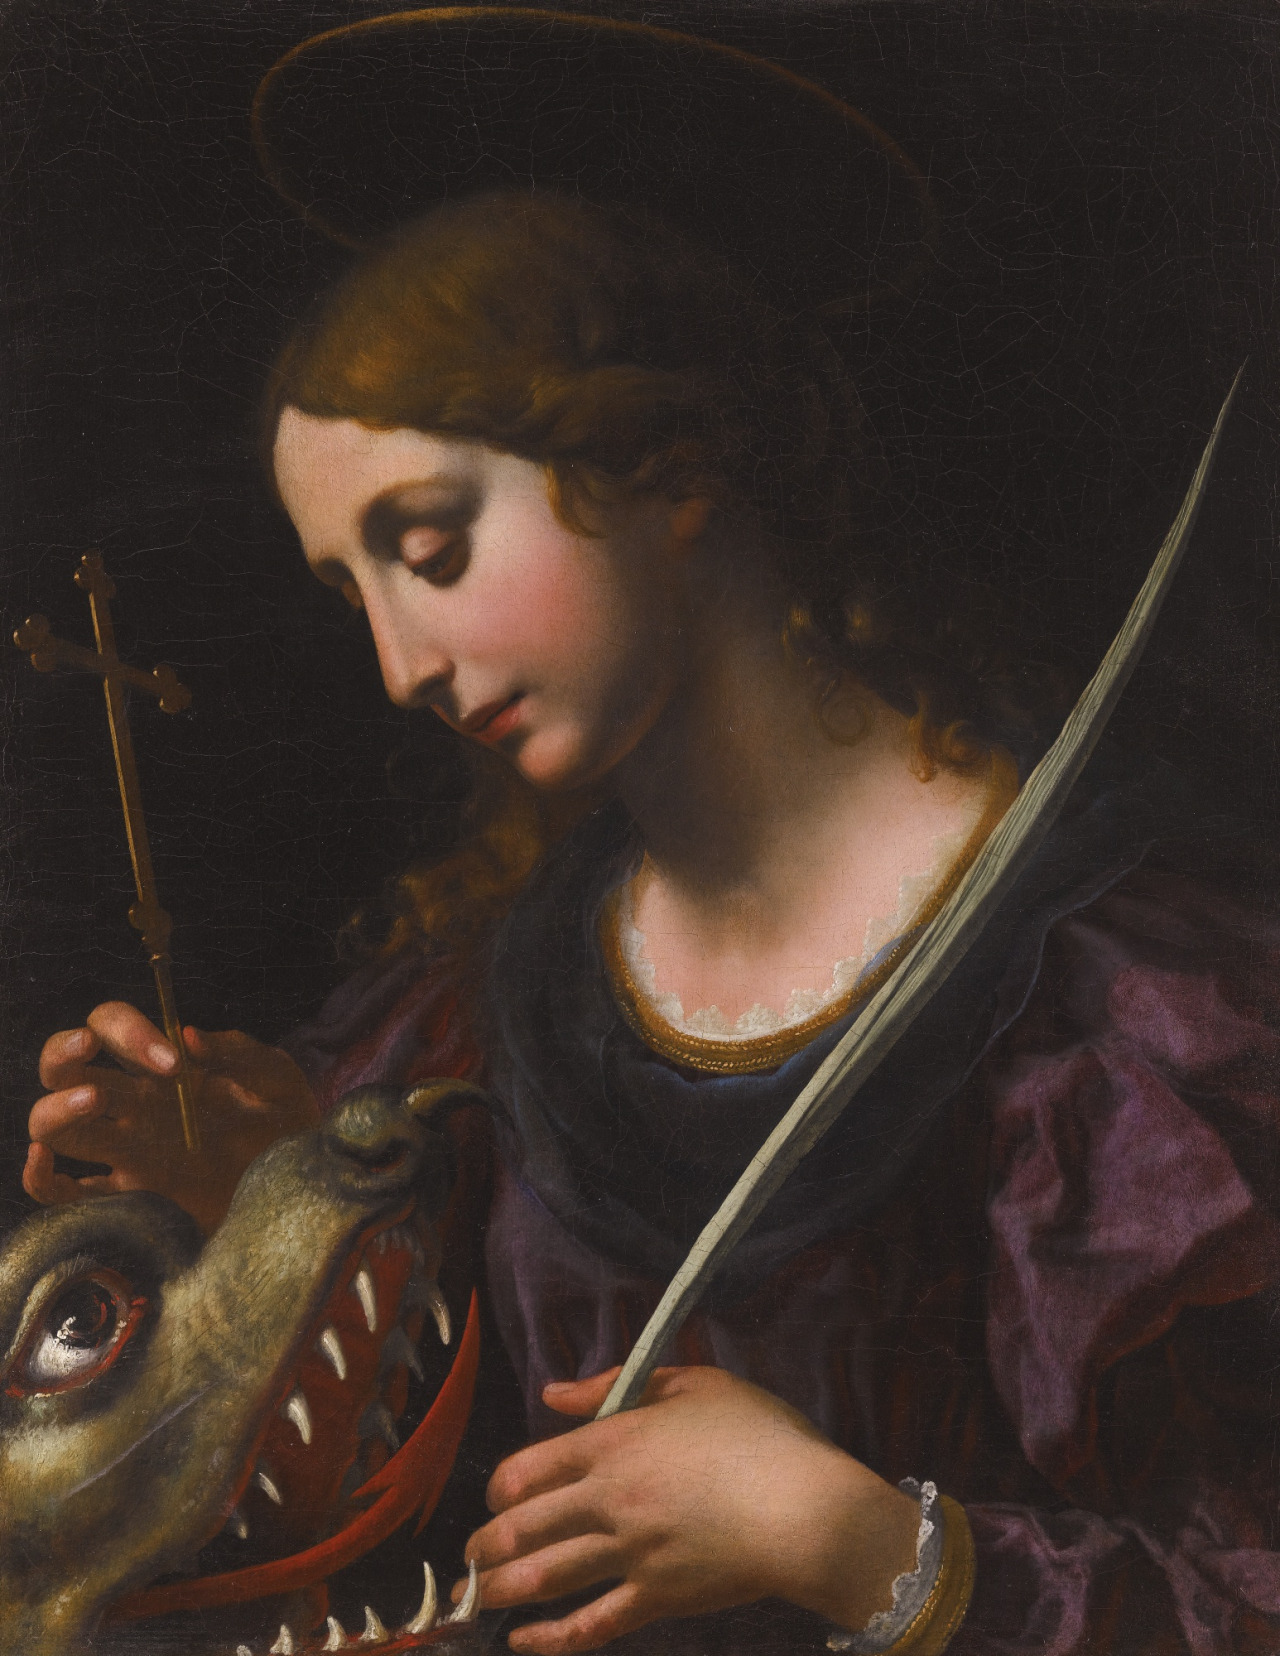 1600s-onoriomarinari-stmarg.jpg